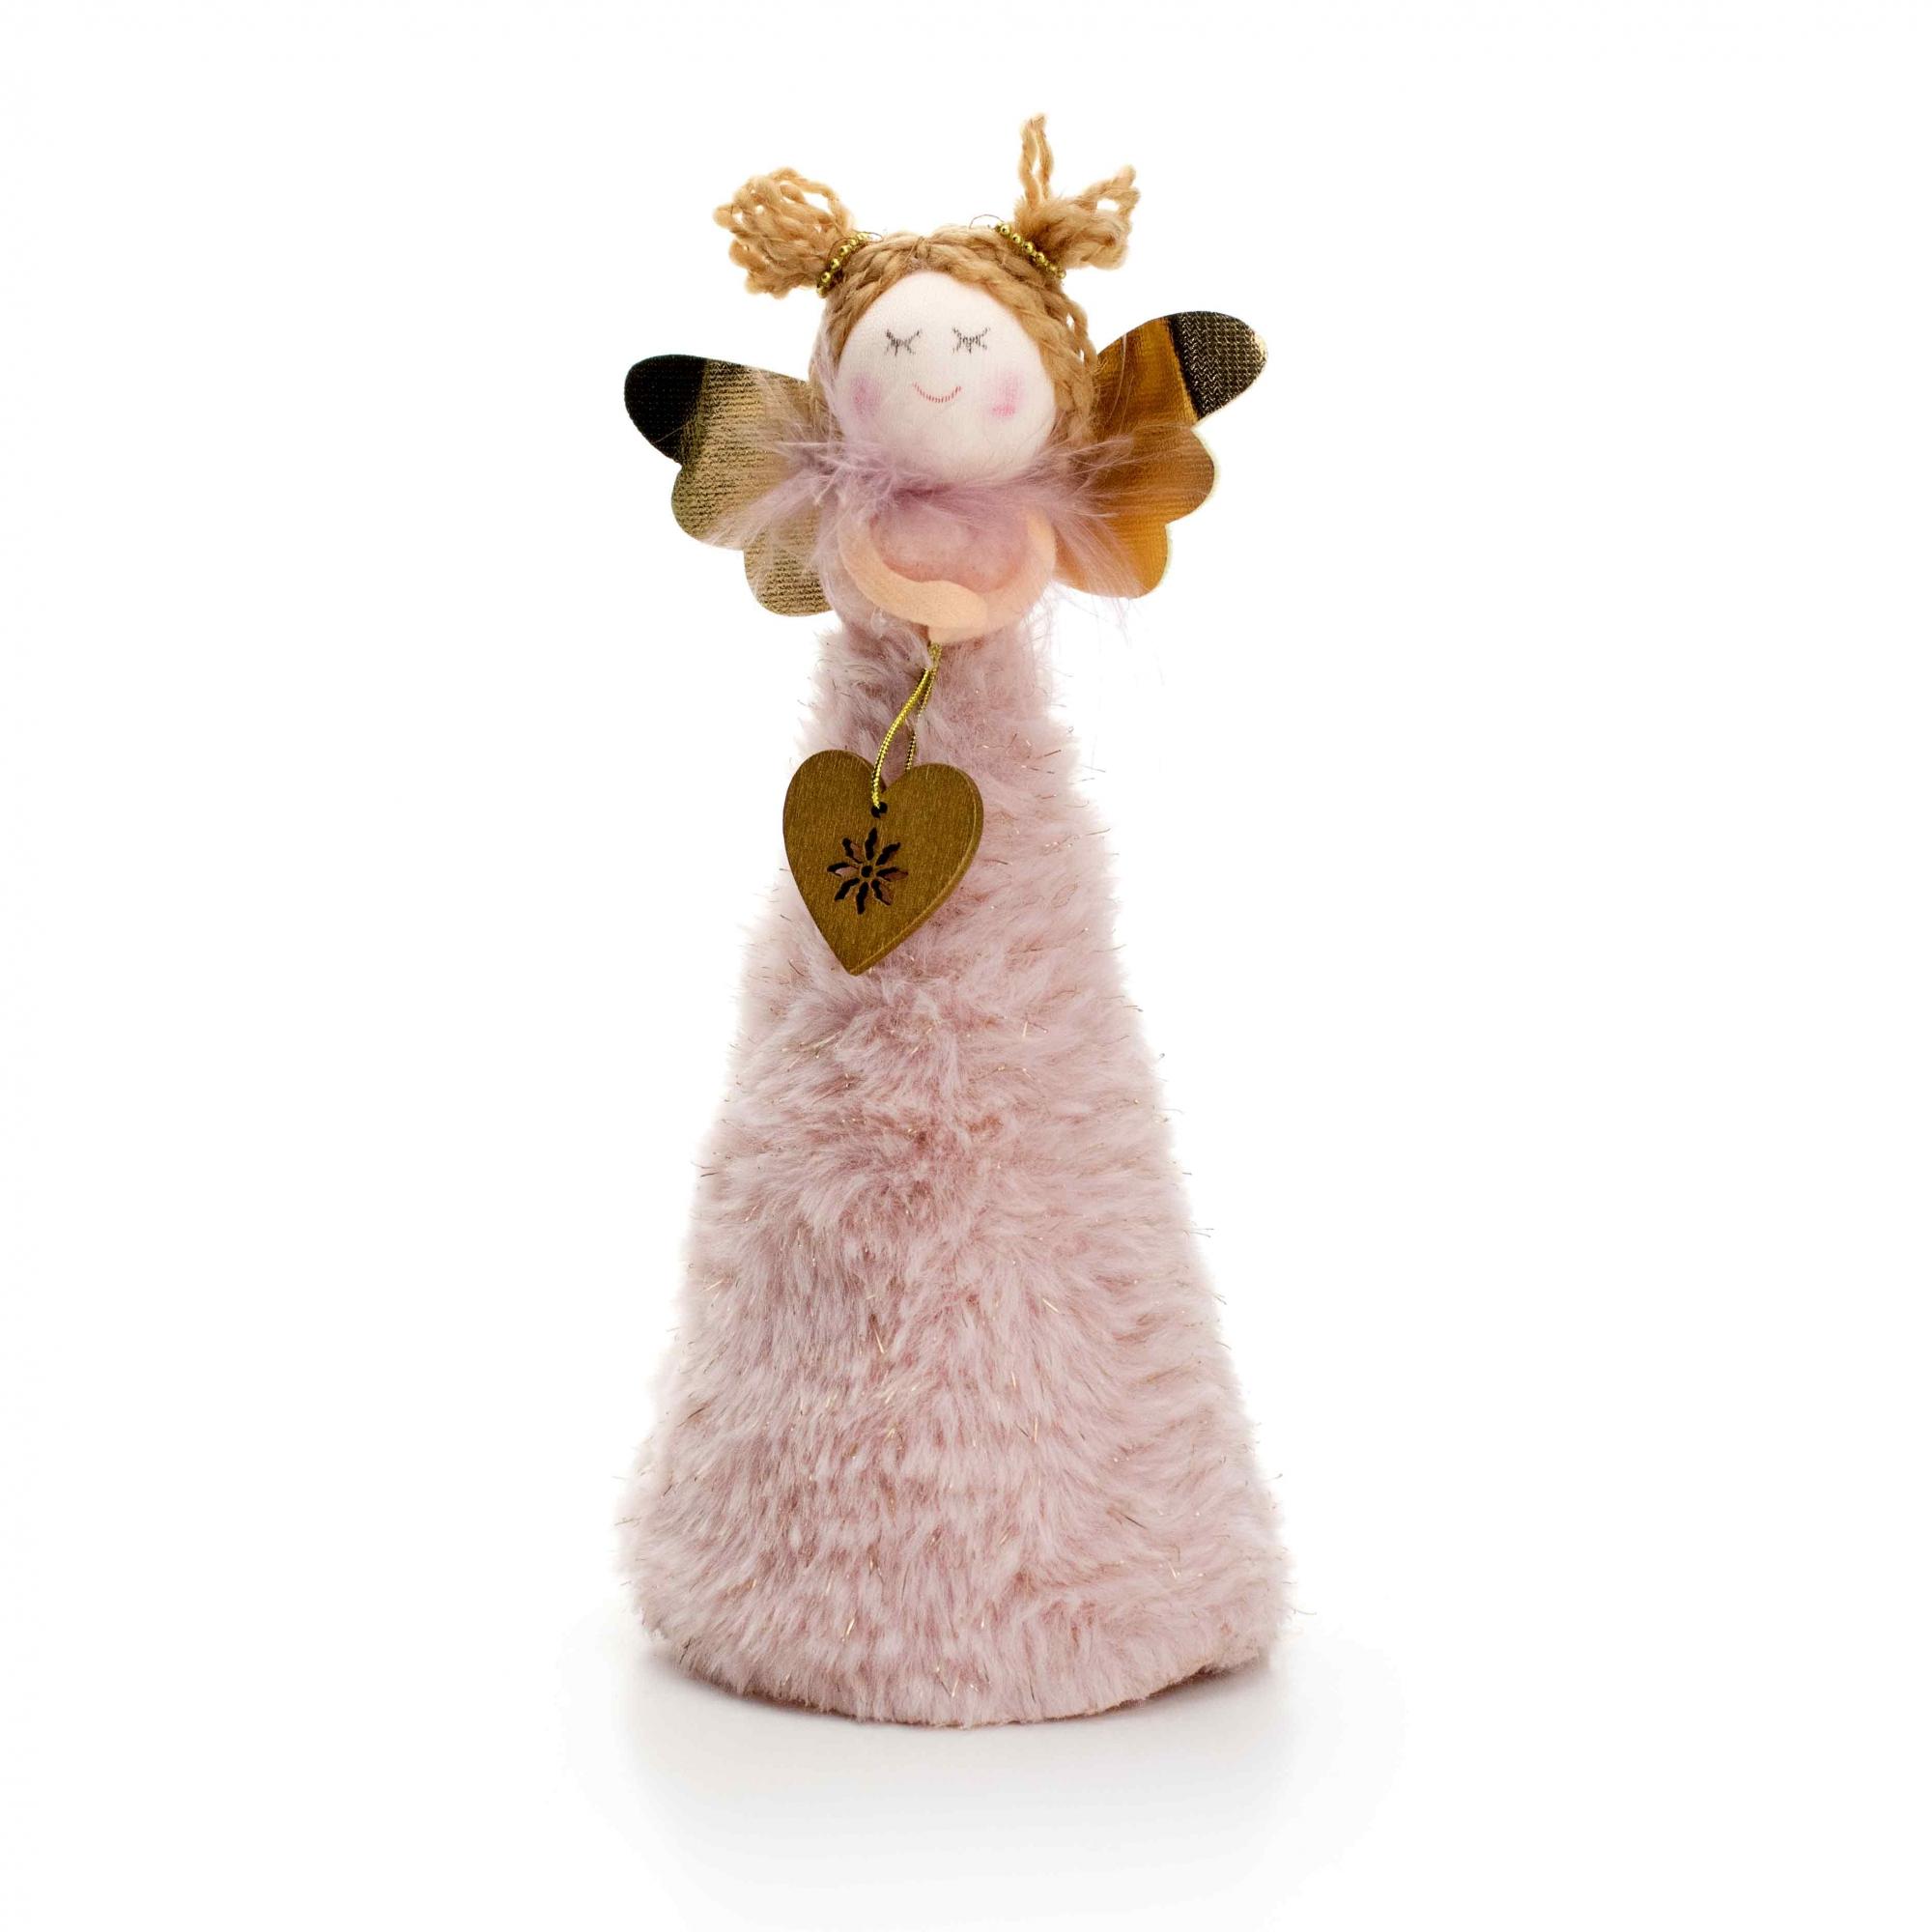 Boneco de Natal Anjo Rosa e Dourado 20 cm - D'Rossi